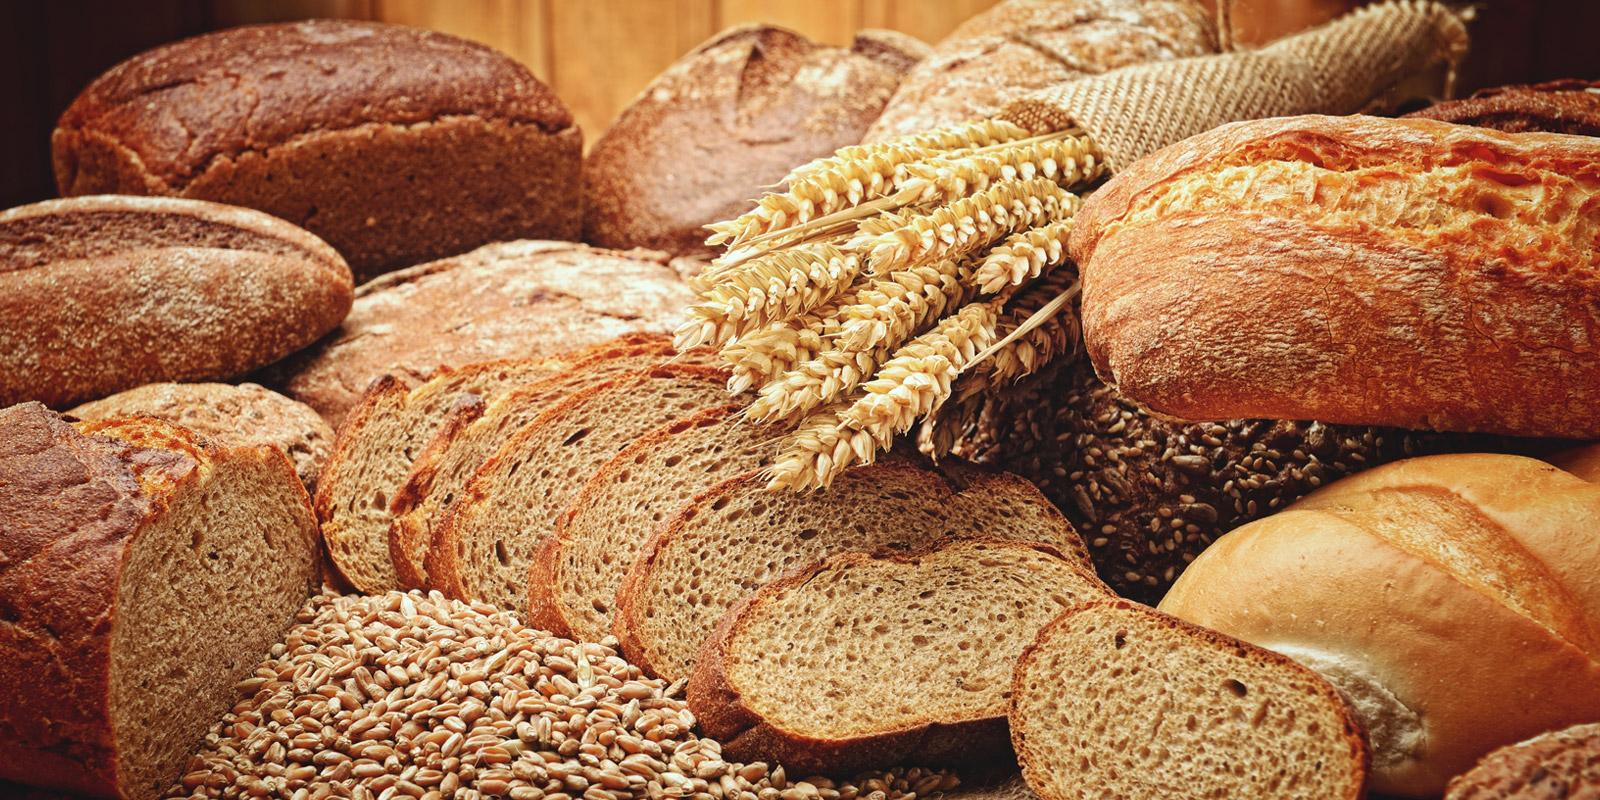 food-allergy-sensitivity-or-intolerance